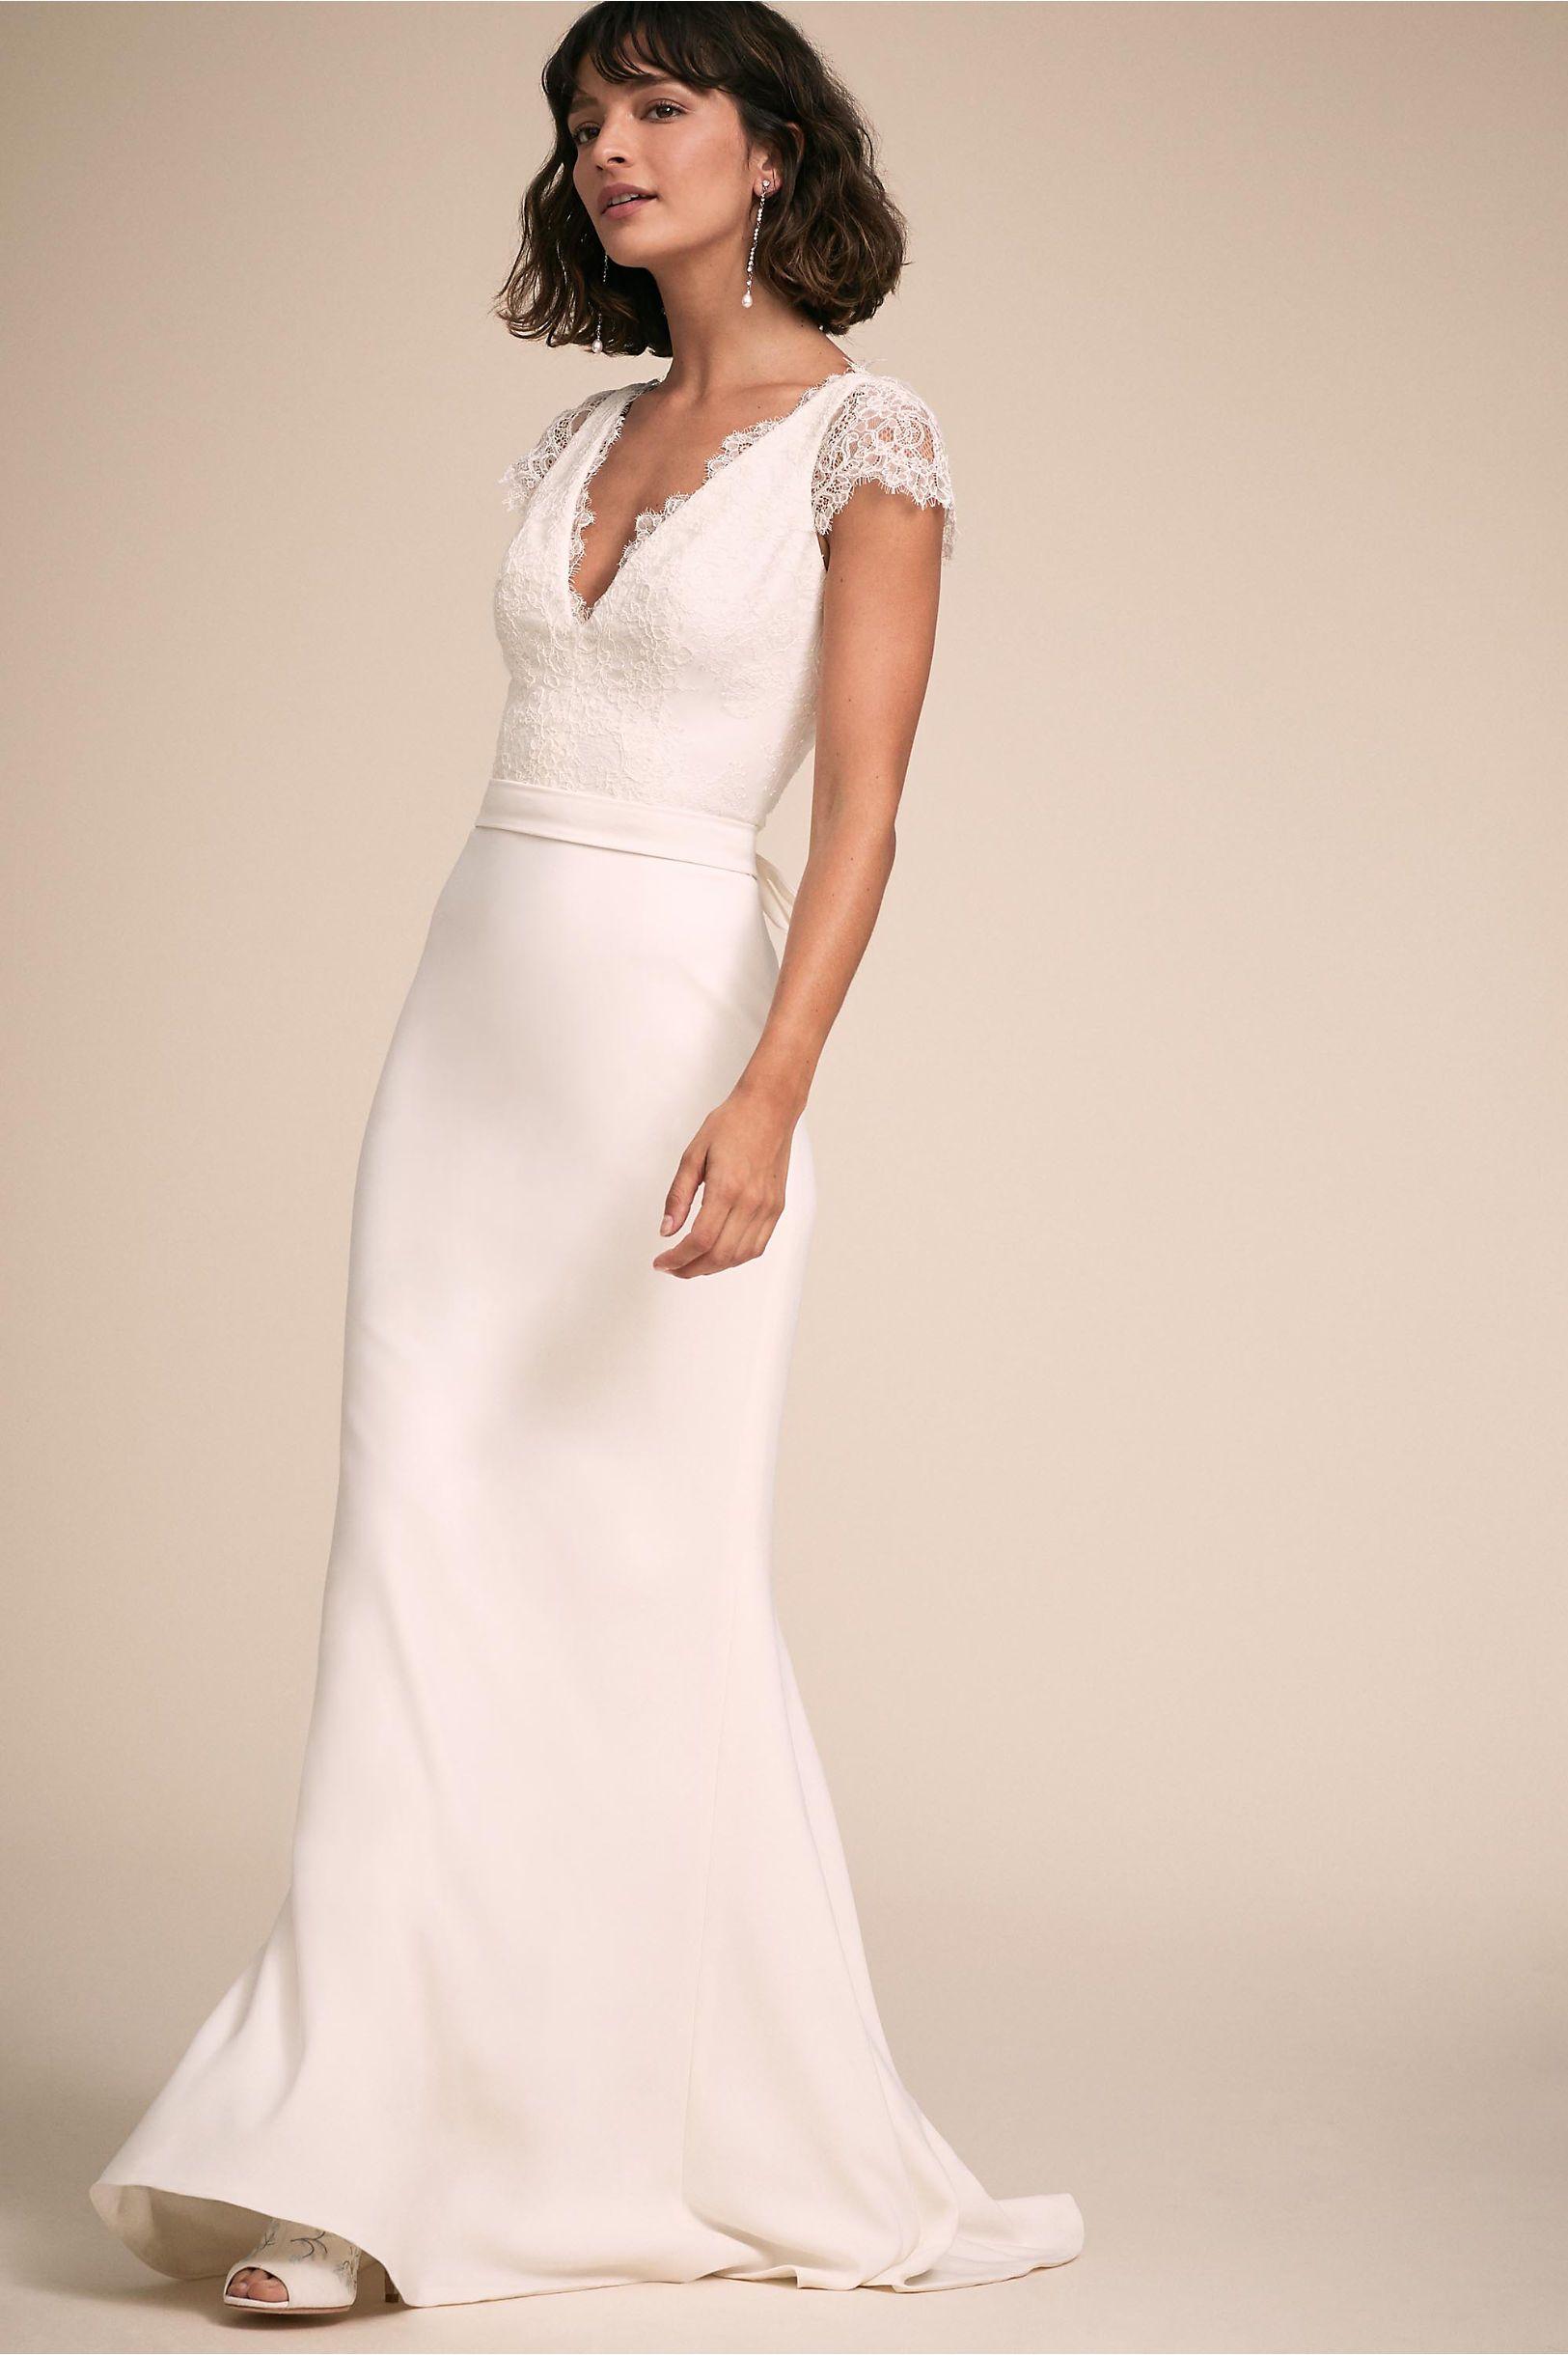 aa443295c2878 Smith Gown Ivory in Bride | BHLDN | Dress | Bhldn wedding dress ...